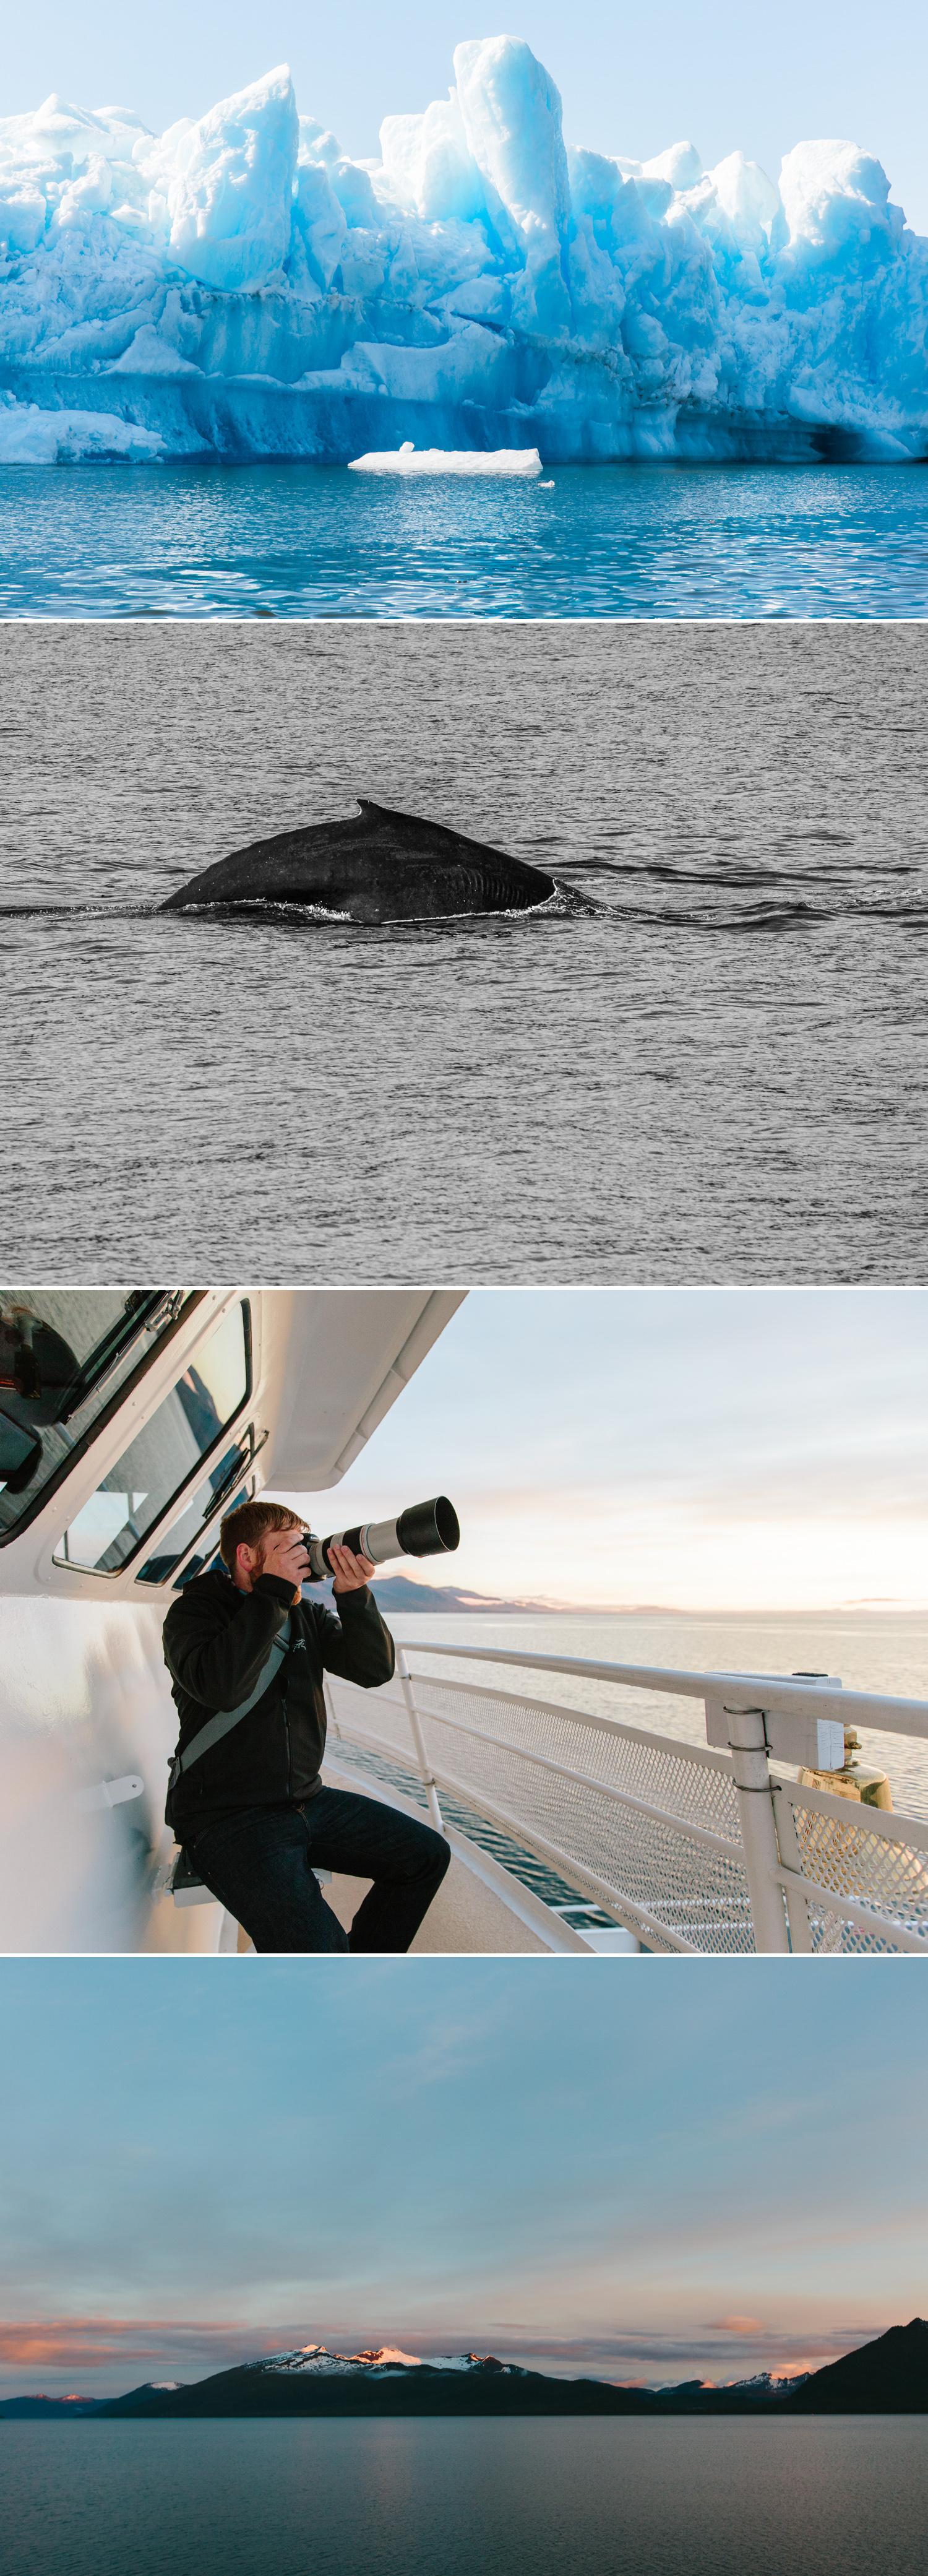 cameron-zegers-photography-alaska-uncruise-travel-4.jpg